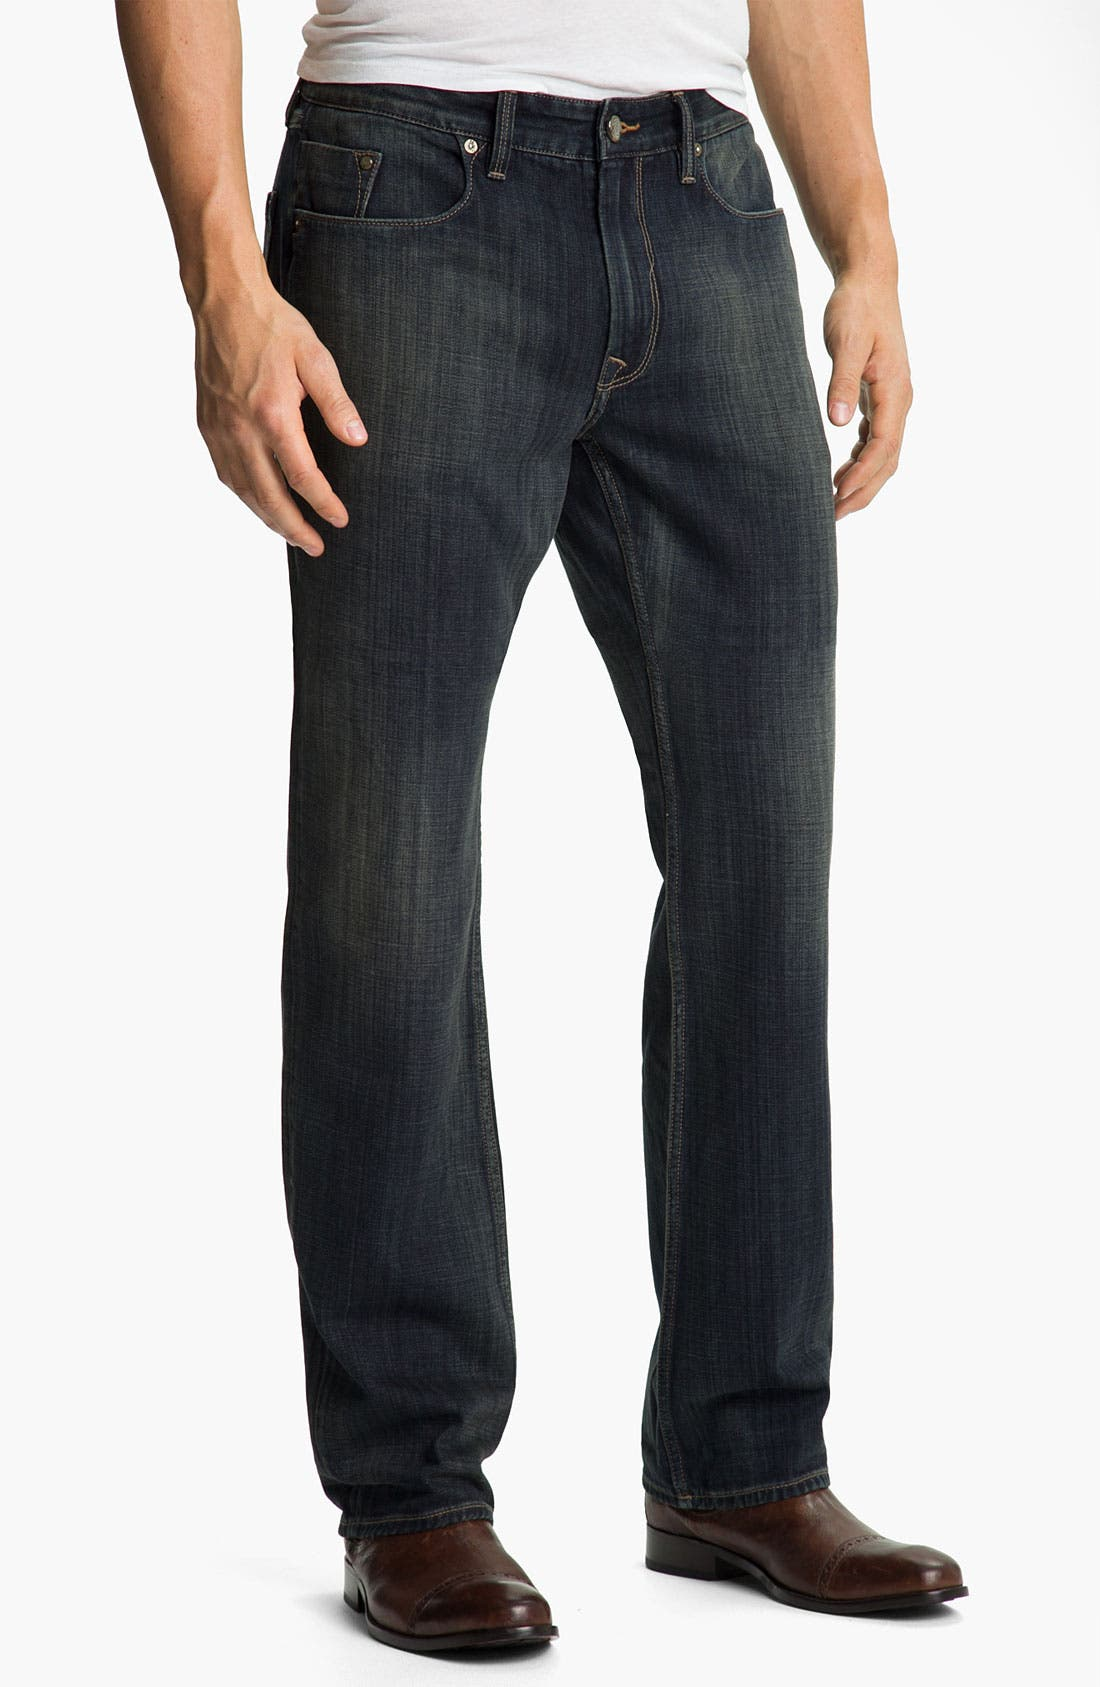 Main Image - Robert Graham Jeans 'Orion' Straight Leg Jeans (Indigo)